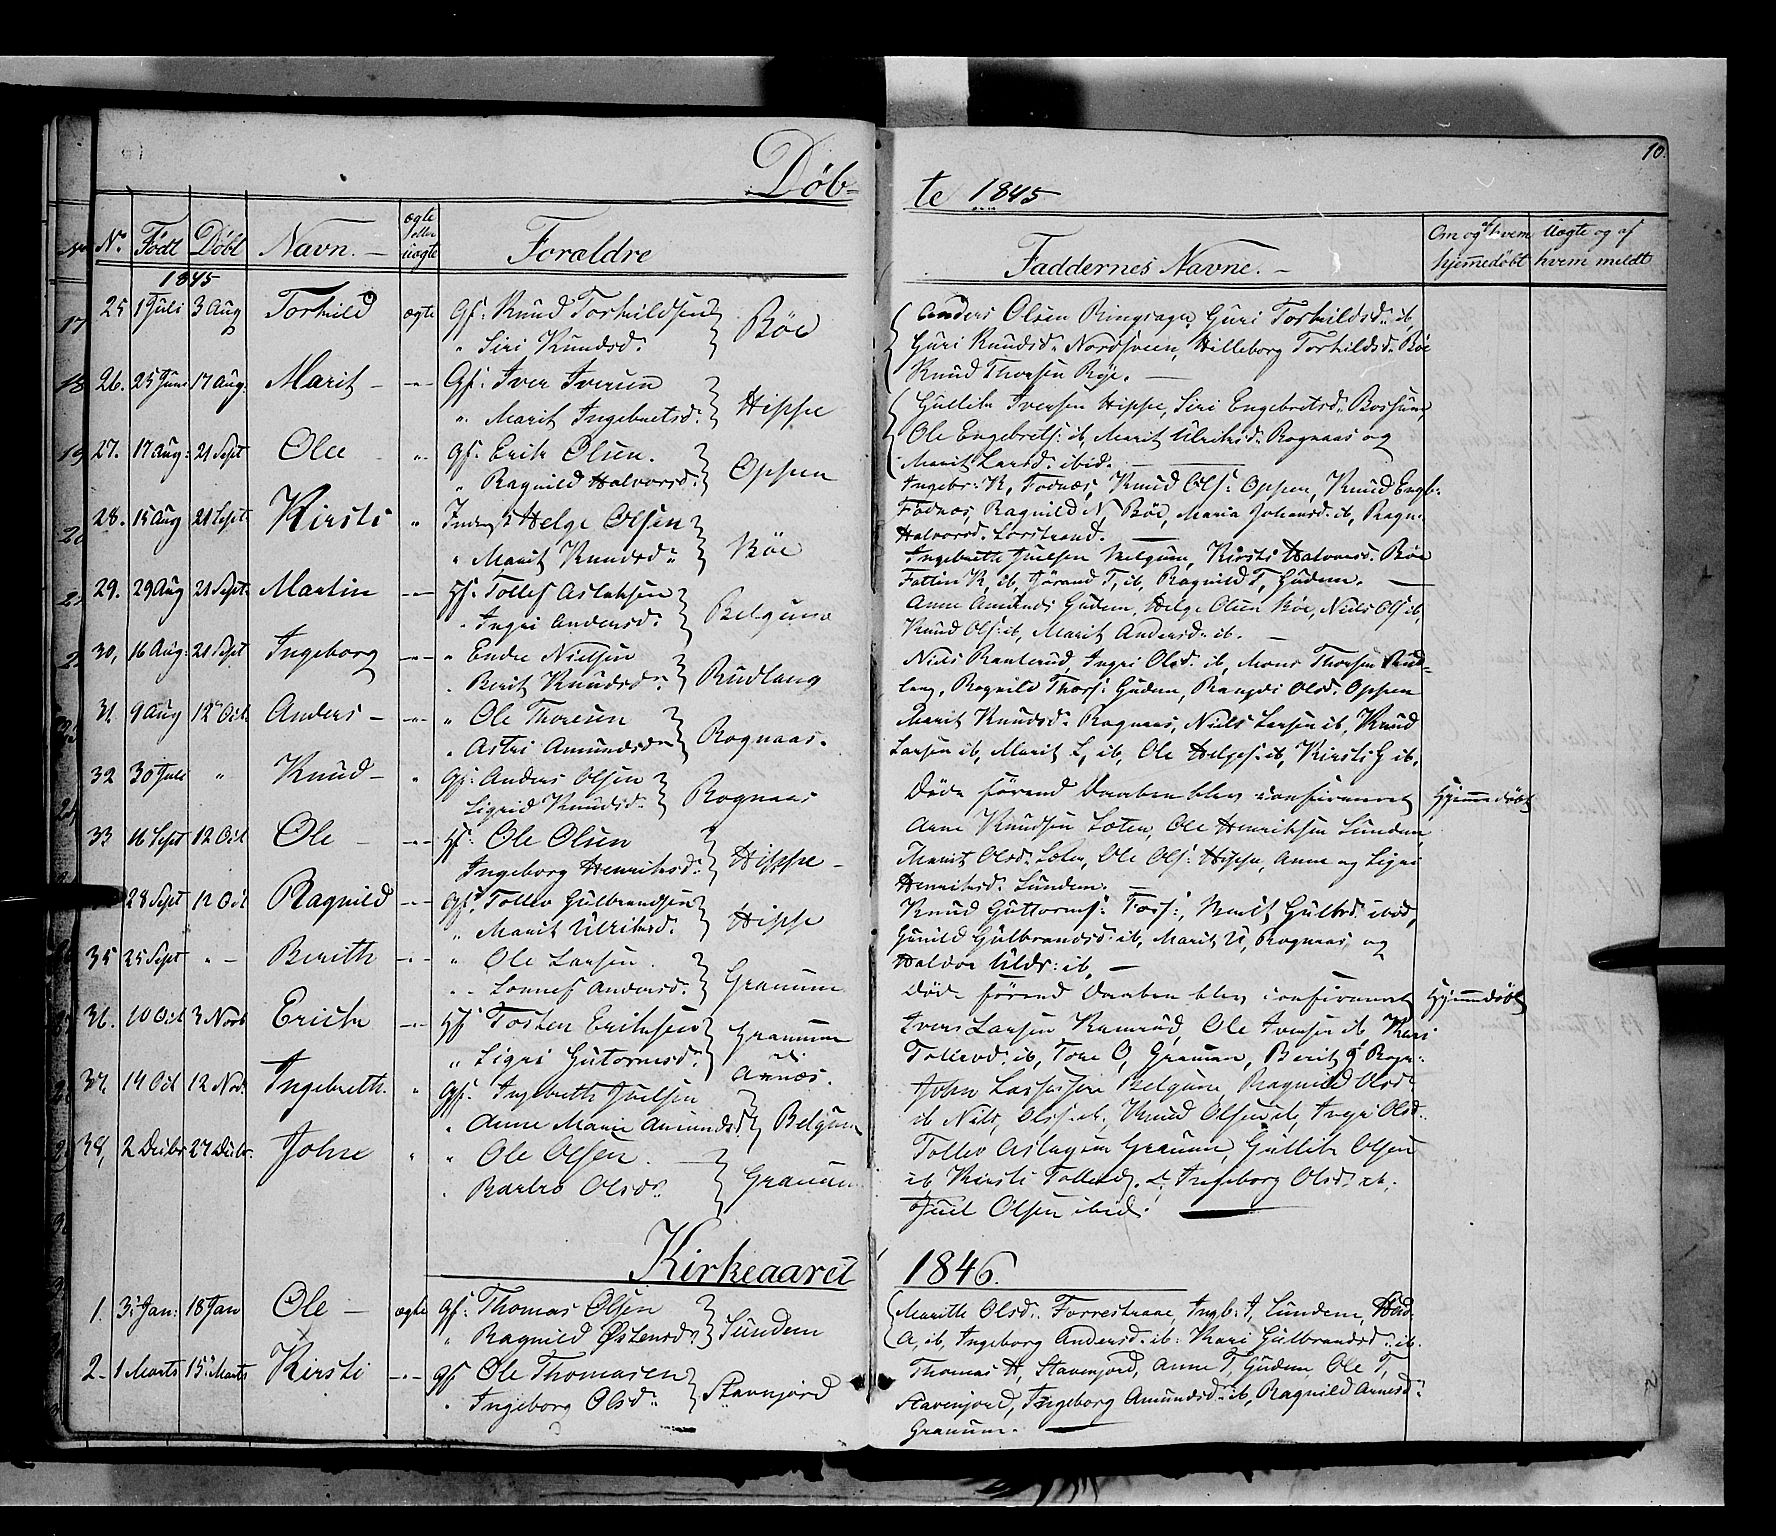 SAH, Nord-Aurdal prestekontor, Ministerialbok nr. 6, 1842-1863, s. 10